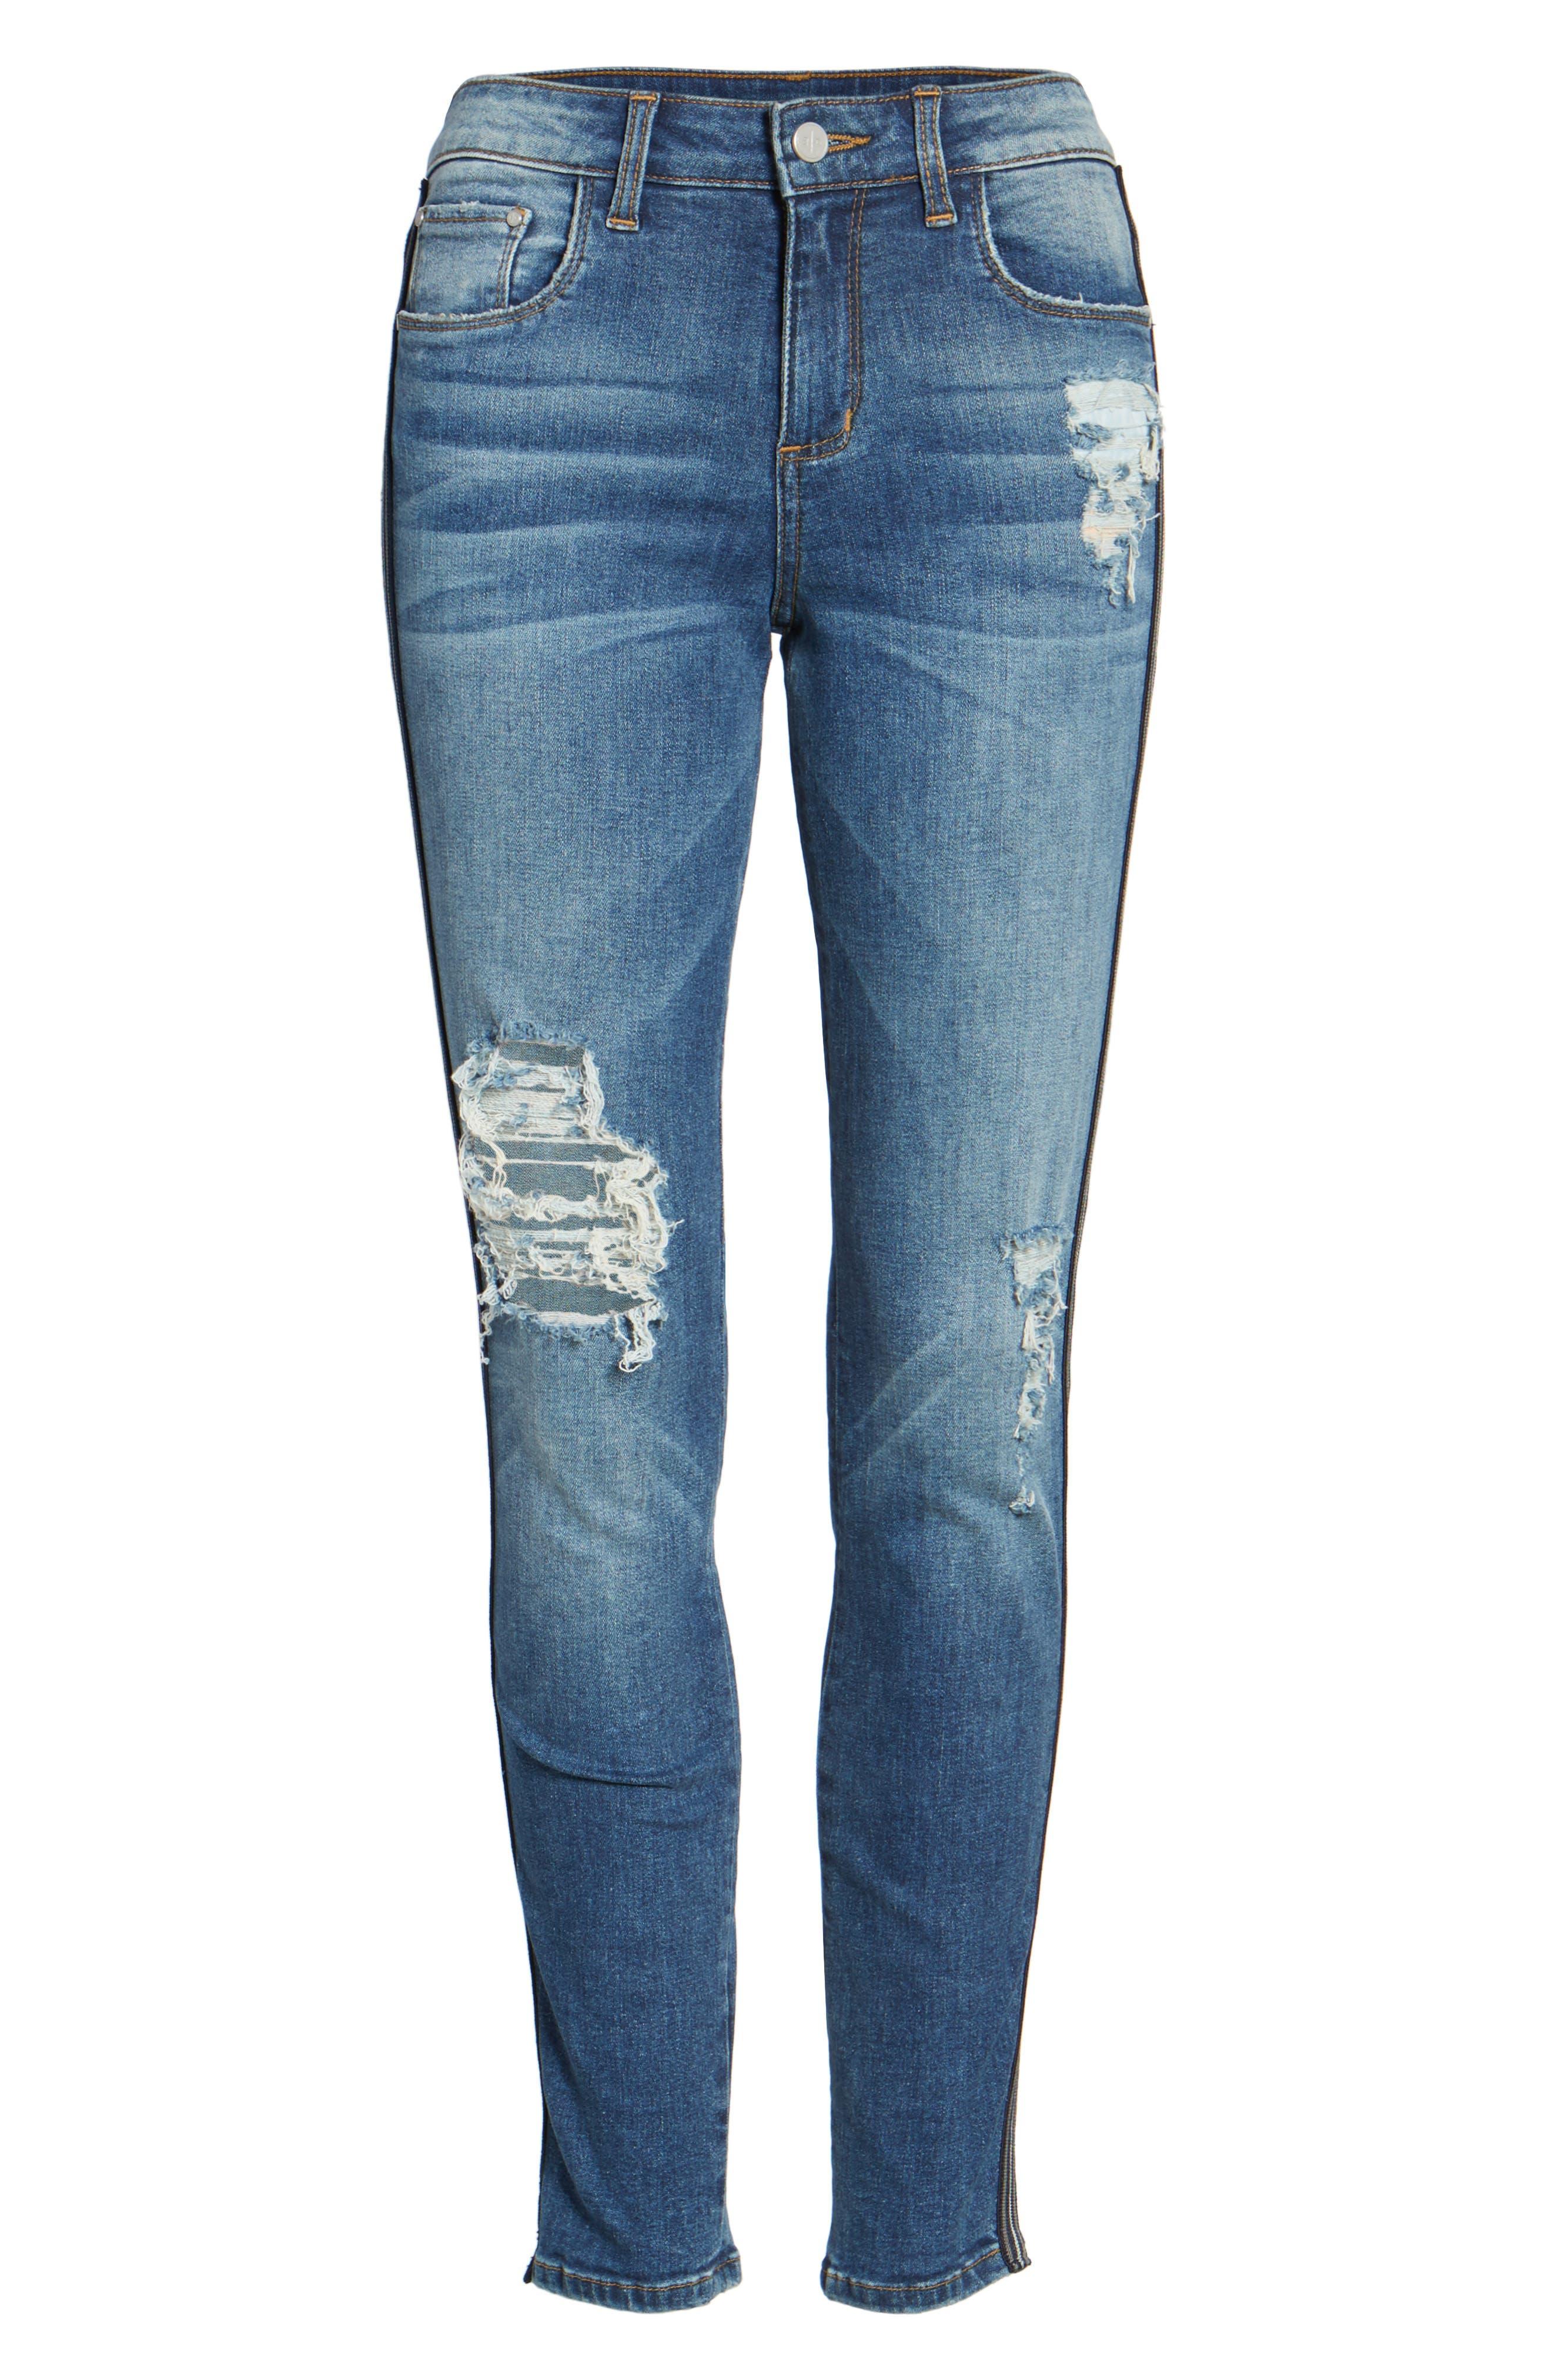 Tuxedo Stripe Ripped Skinny Jeans,                             Alternate thumbnail 5, color,                             Medium Wash